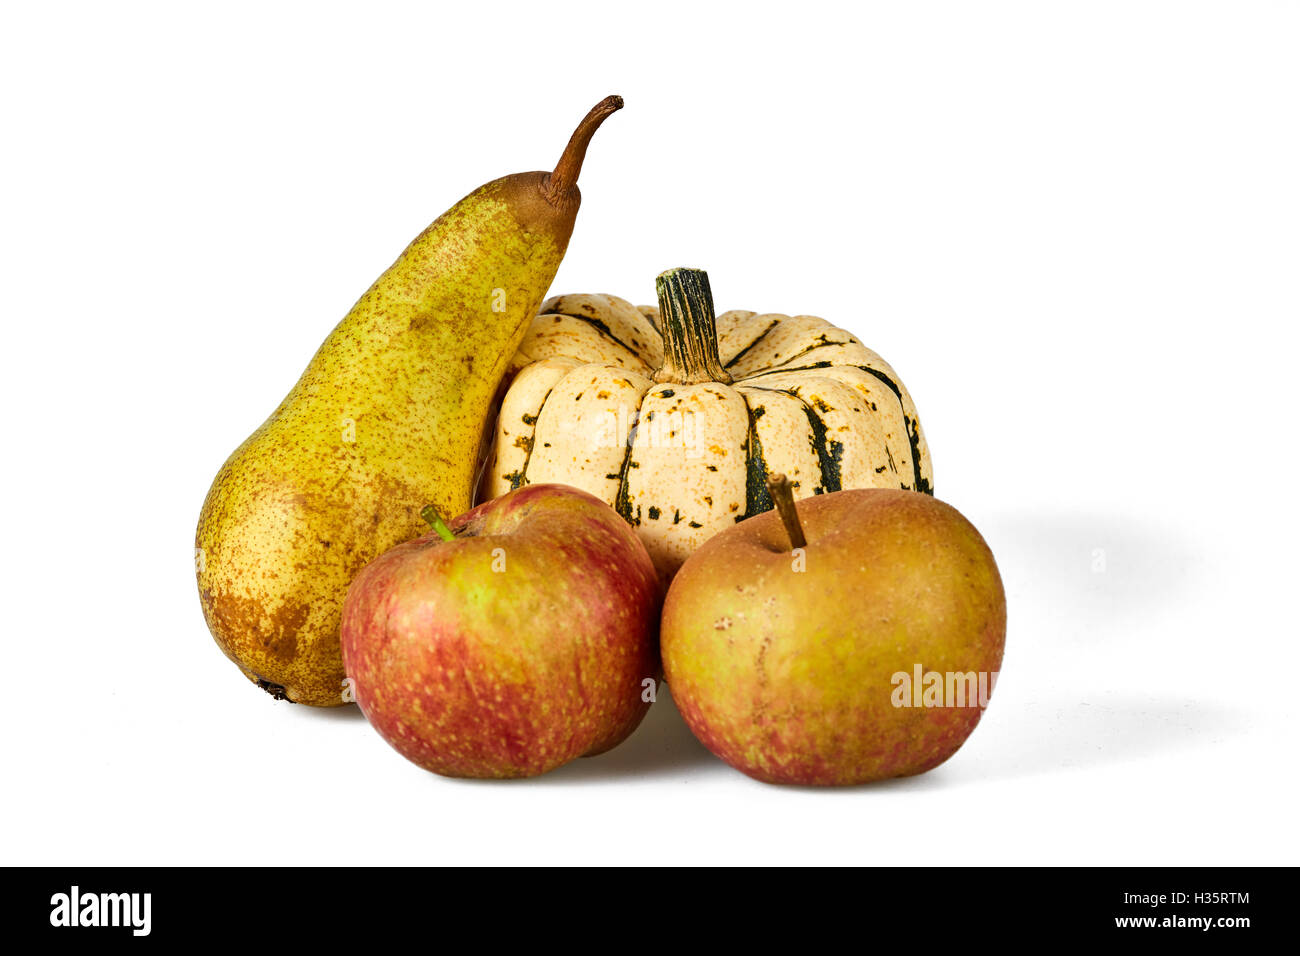 Isolated apple, pear and pumpkin autumn seasonal fruits - Stock Image